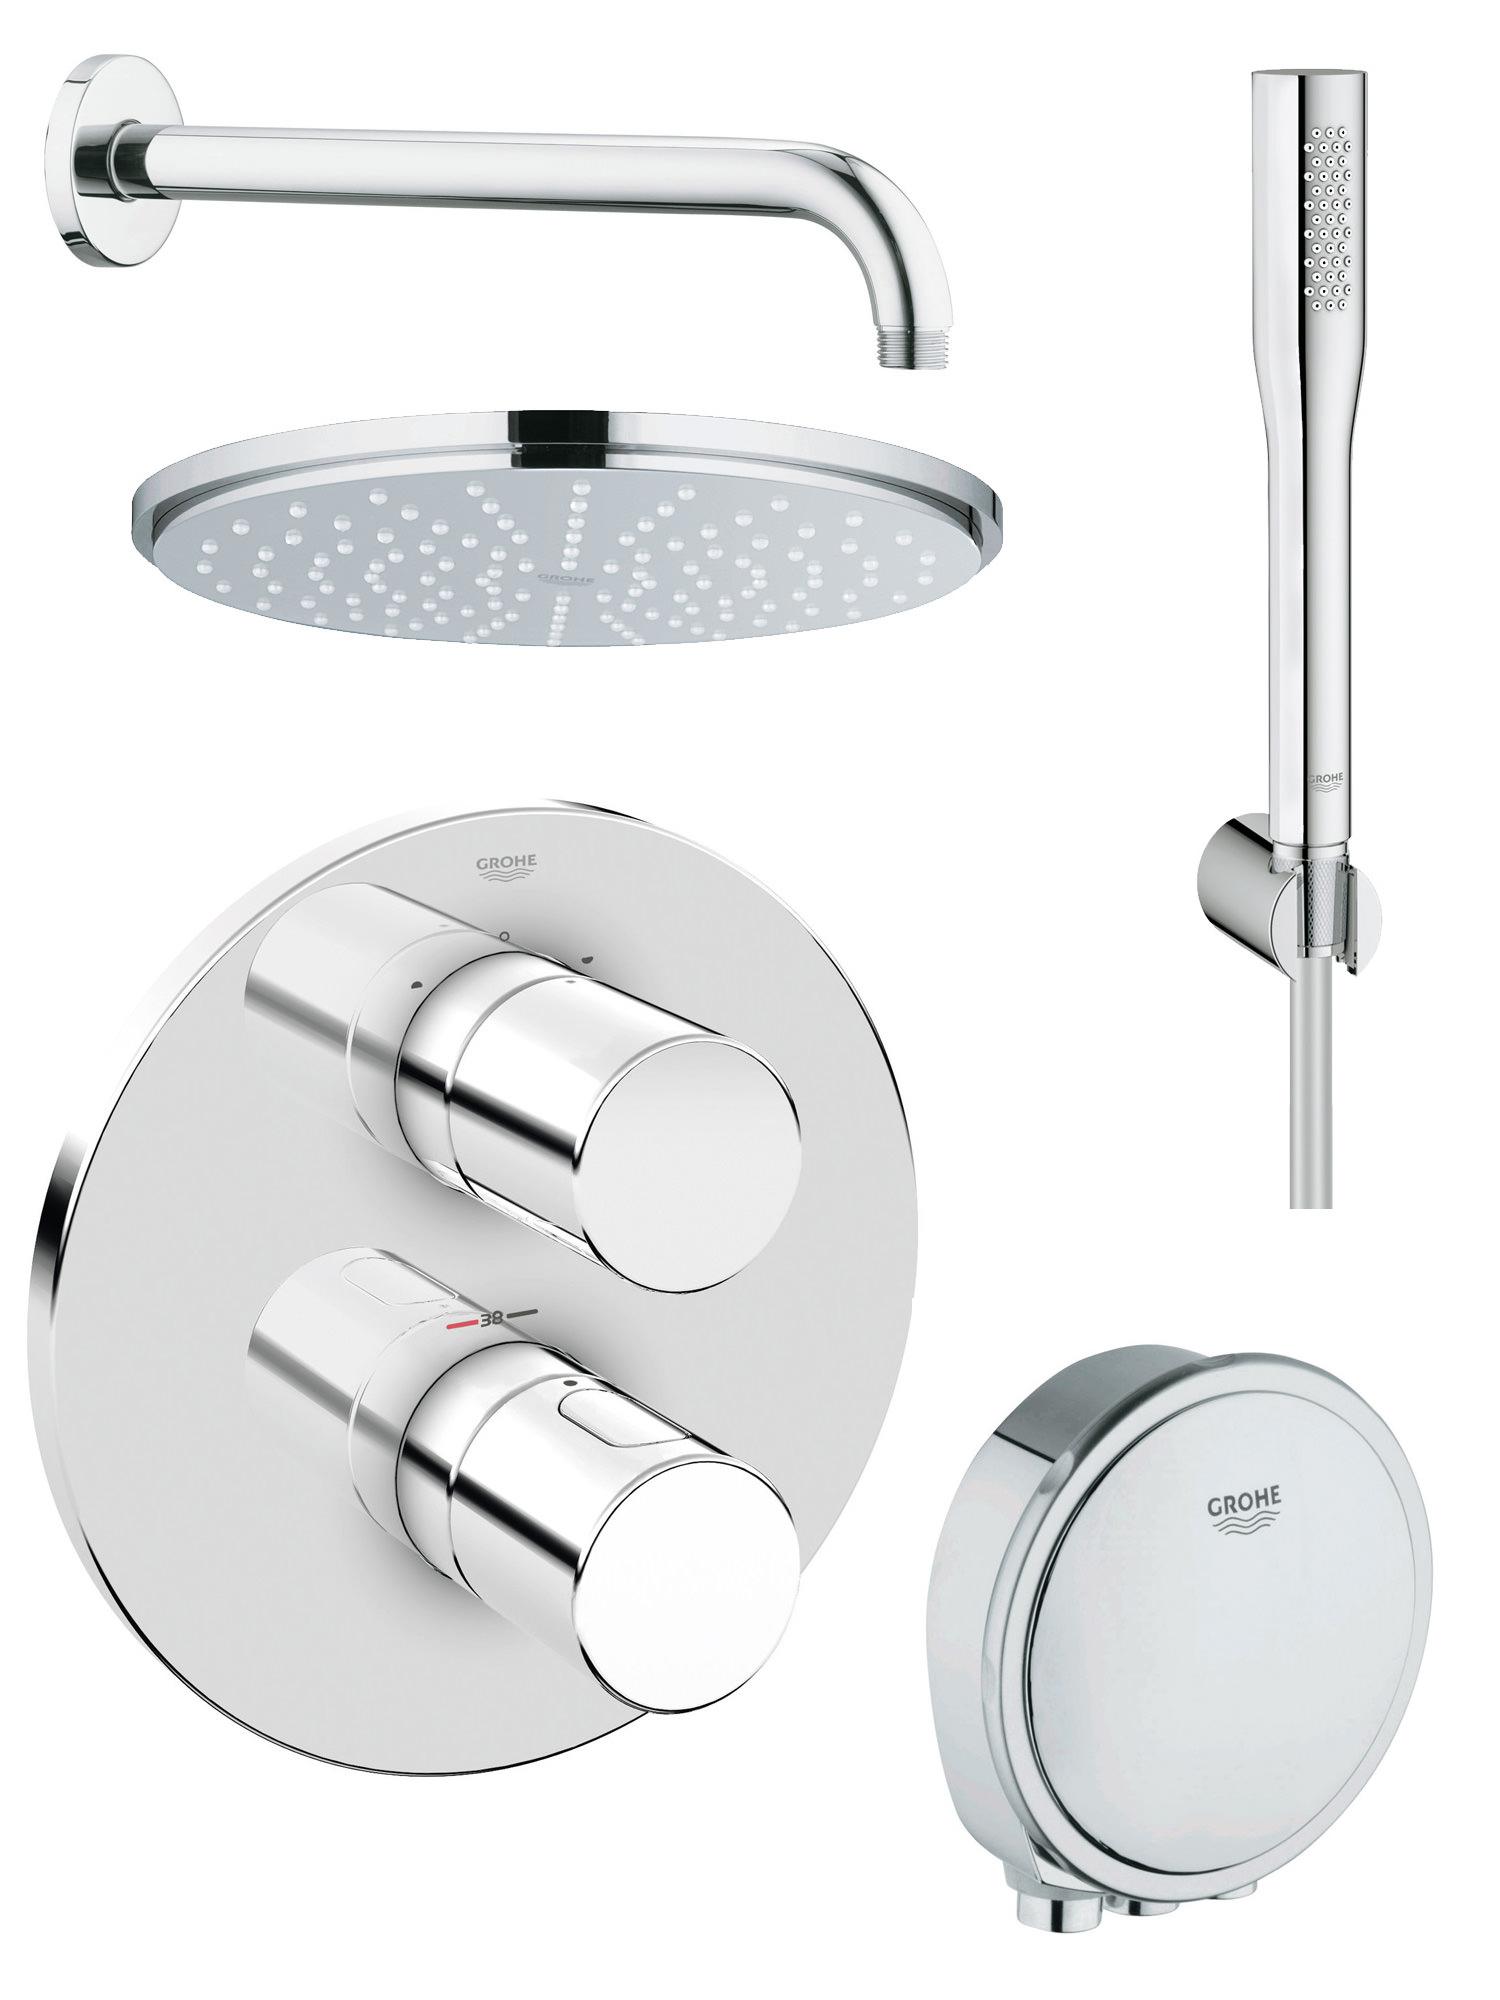 grohe grohtherm 3000 cosmopolitan bath shower shower. Black Bedroom Furniture Sets. Home Design Ideas